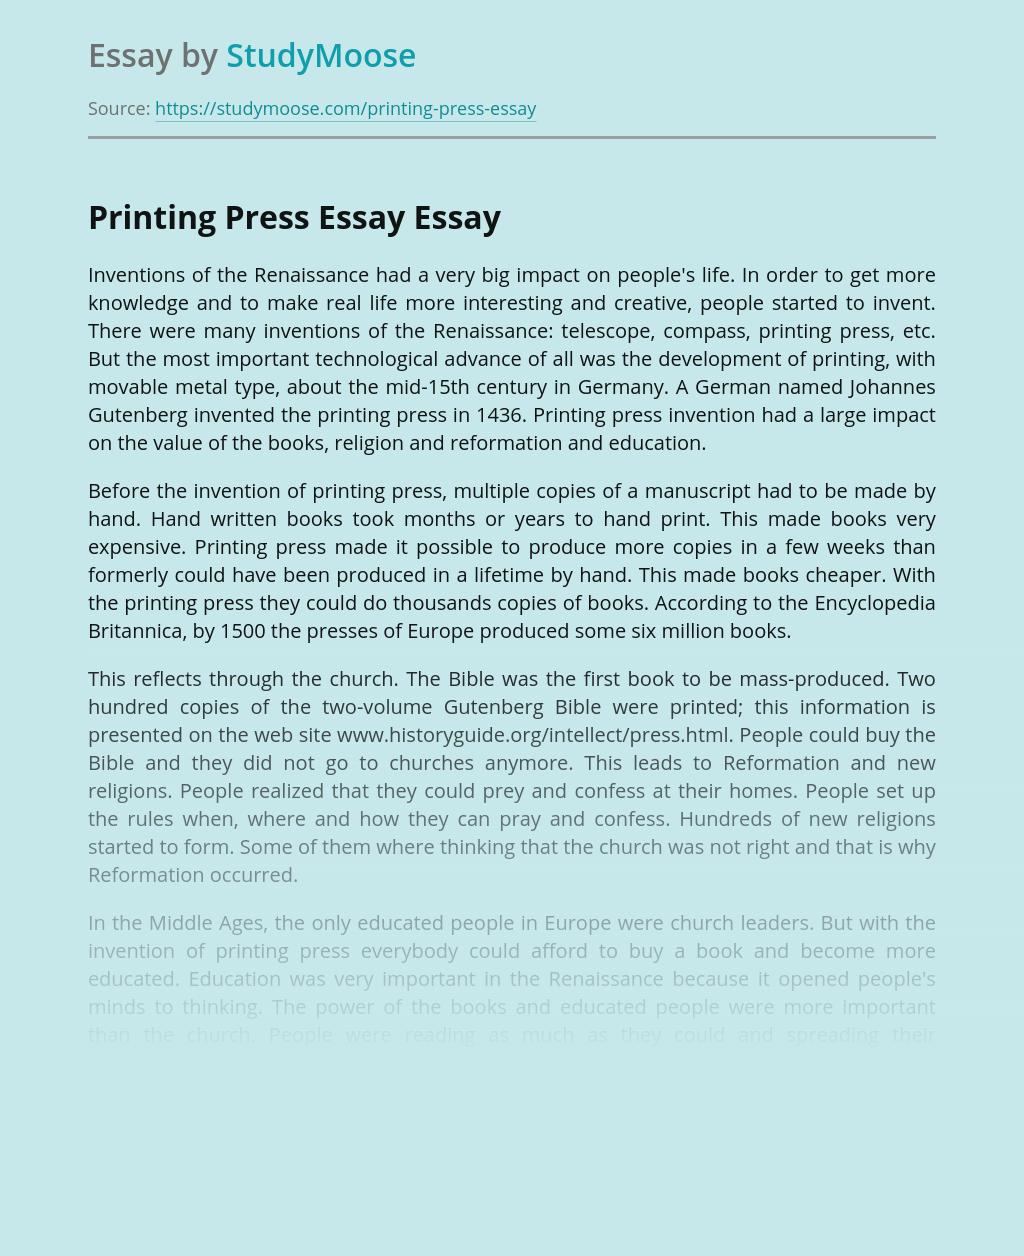 Printing Press Essay